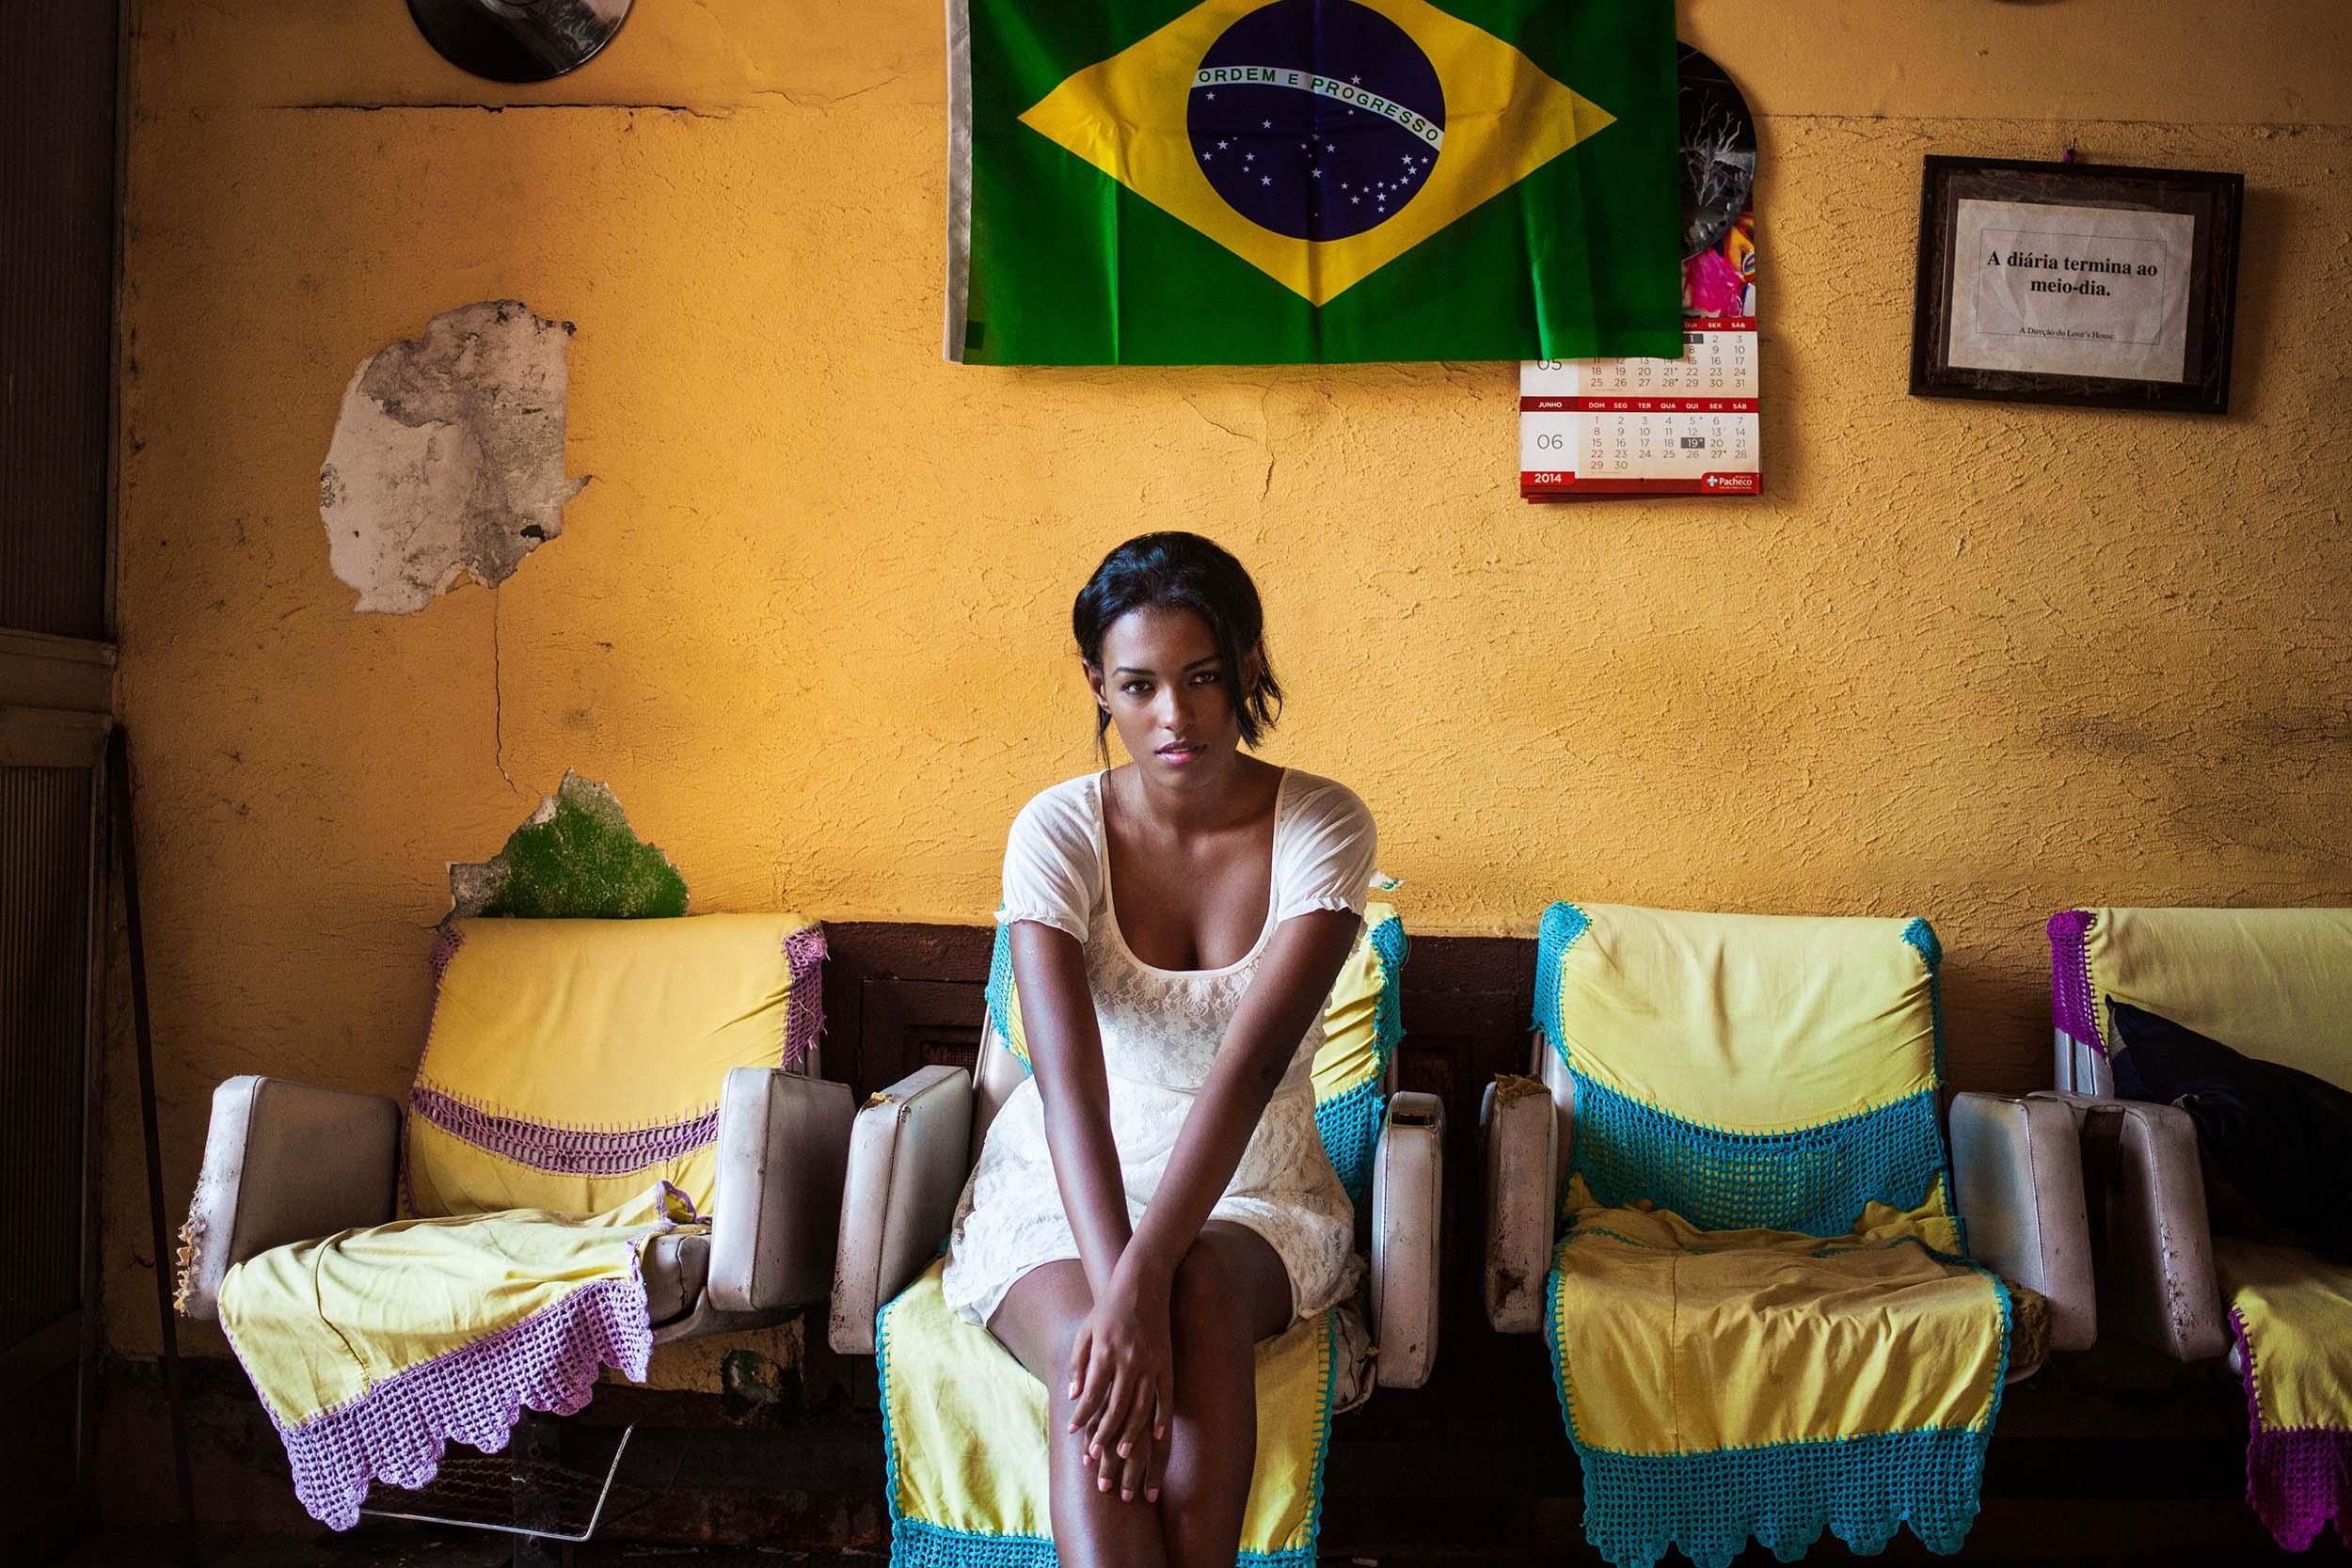 Картинки по запросу atlas of beauty brazil